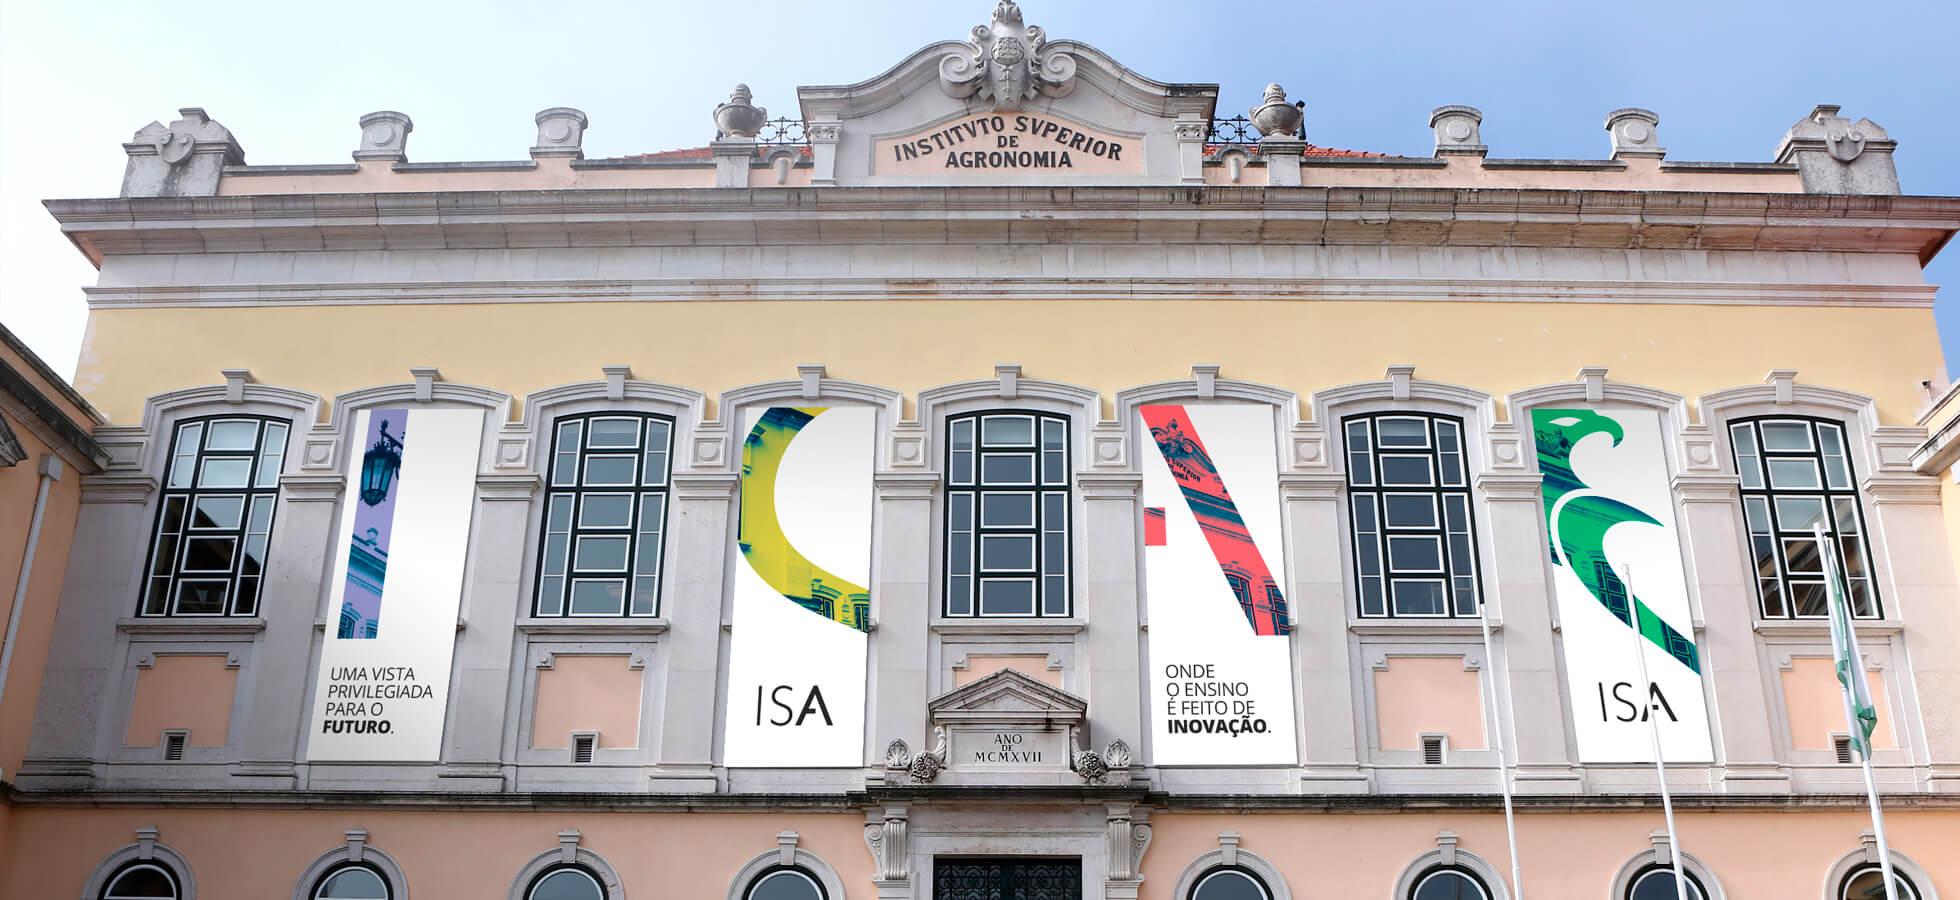 Edificio ISA - fachada